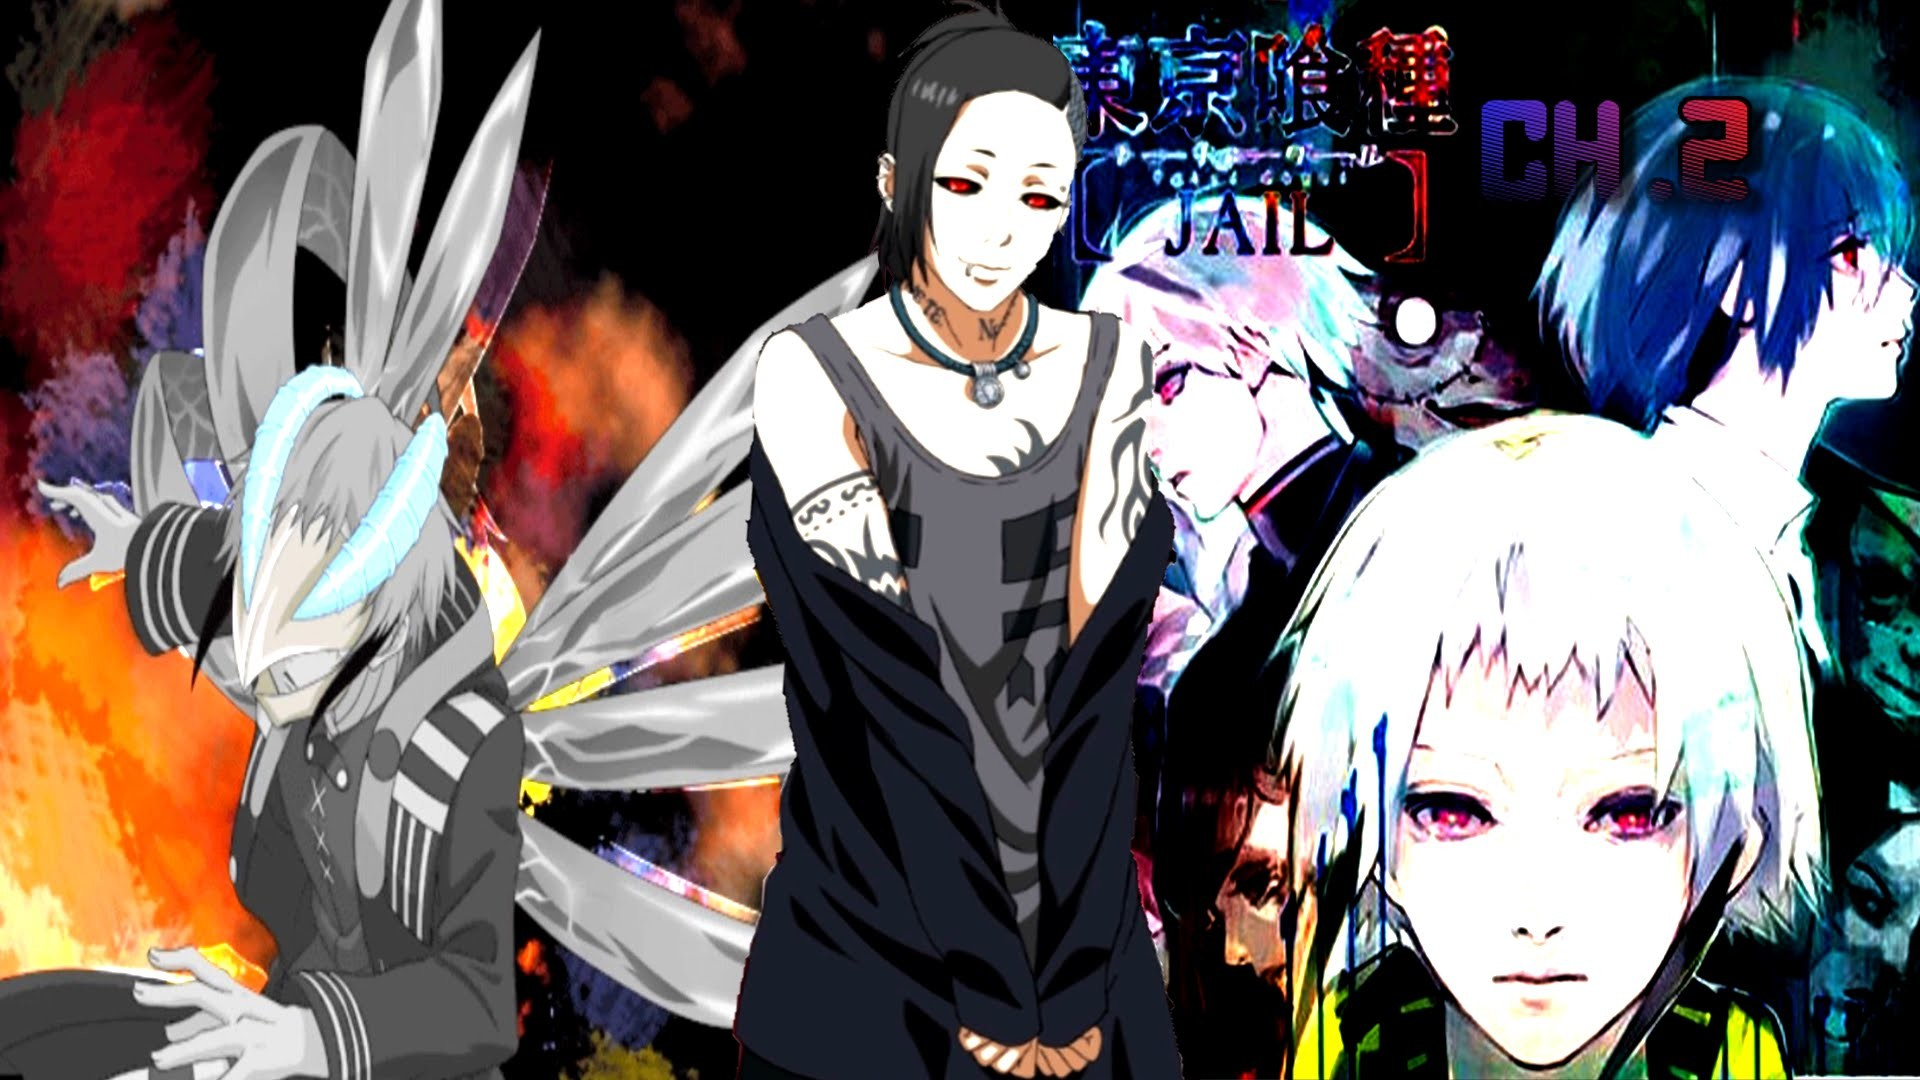 Tokyo Ghoul: Jail Chapter 2 – UTA! & RIO'S MASK/KAGUNE! 東京喰種トーキョーグール Jail –  YouTube